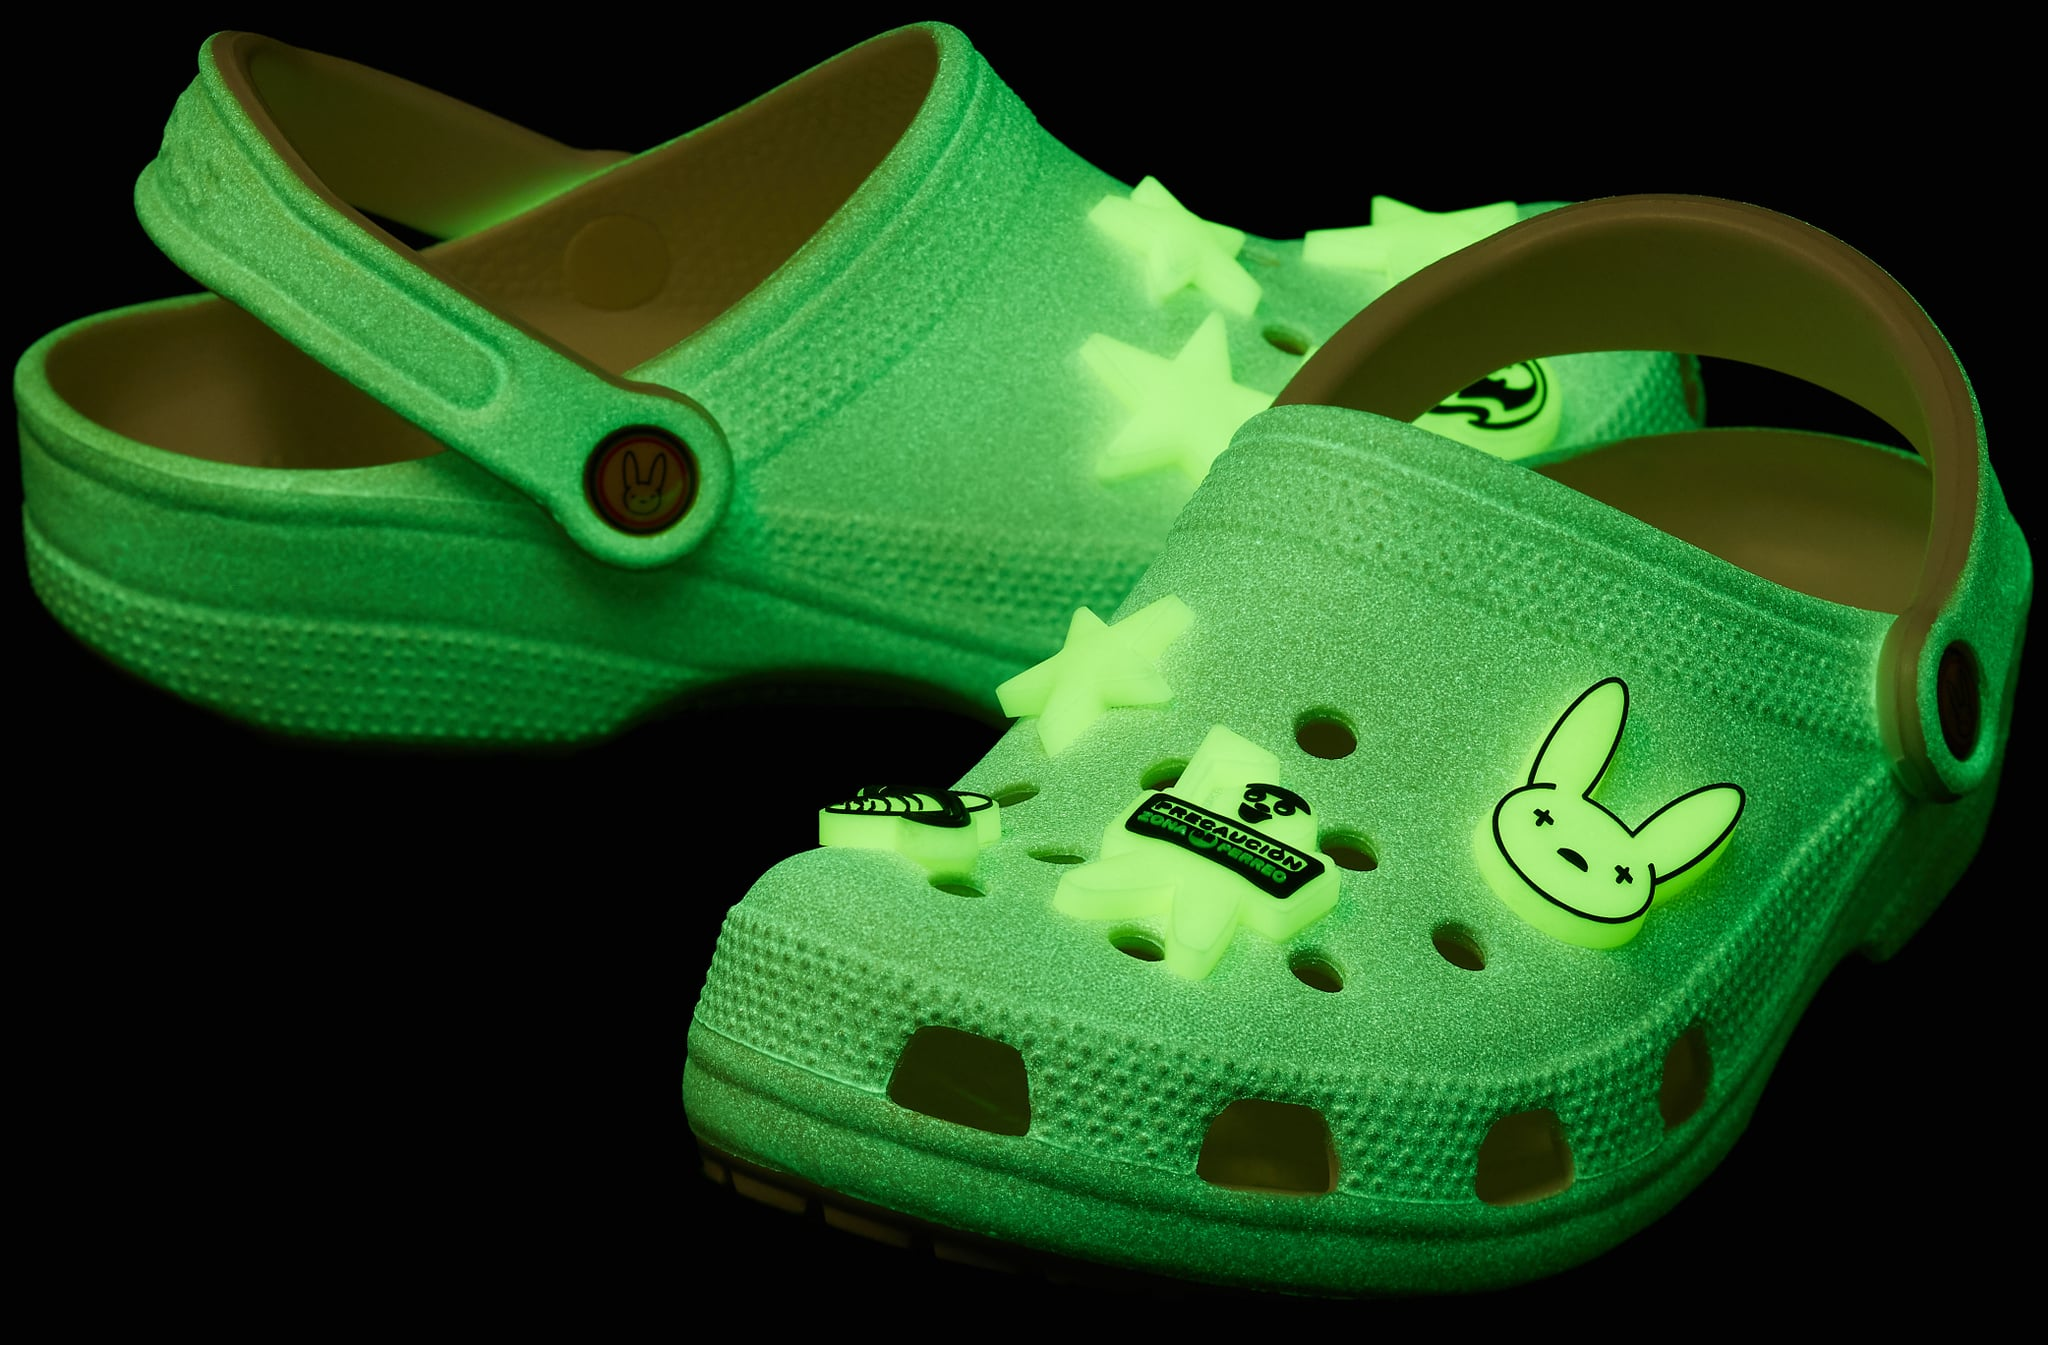 Bad Bunny S Glow In The Dark Crocs Collaboration Popsugar Fashion